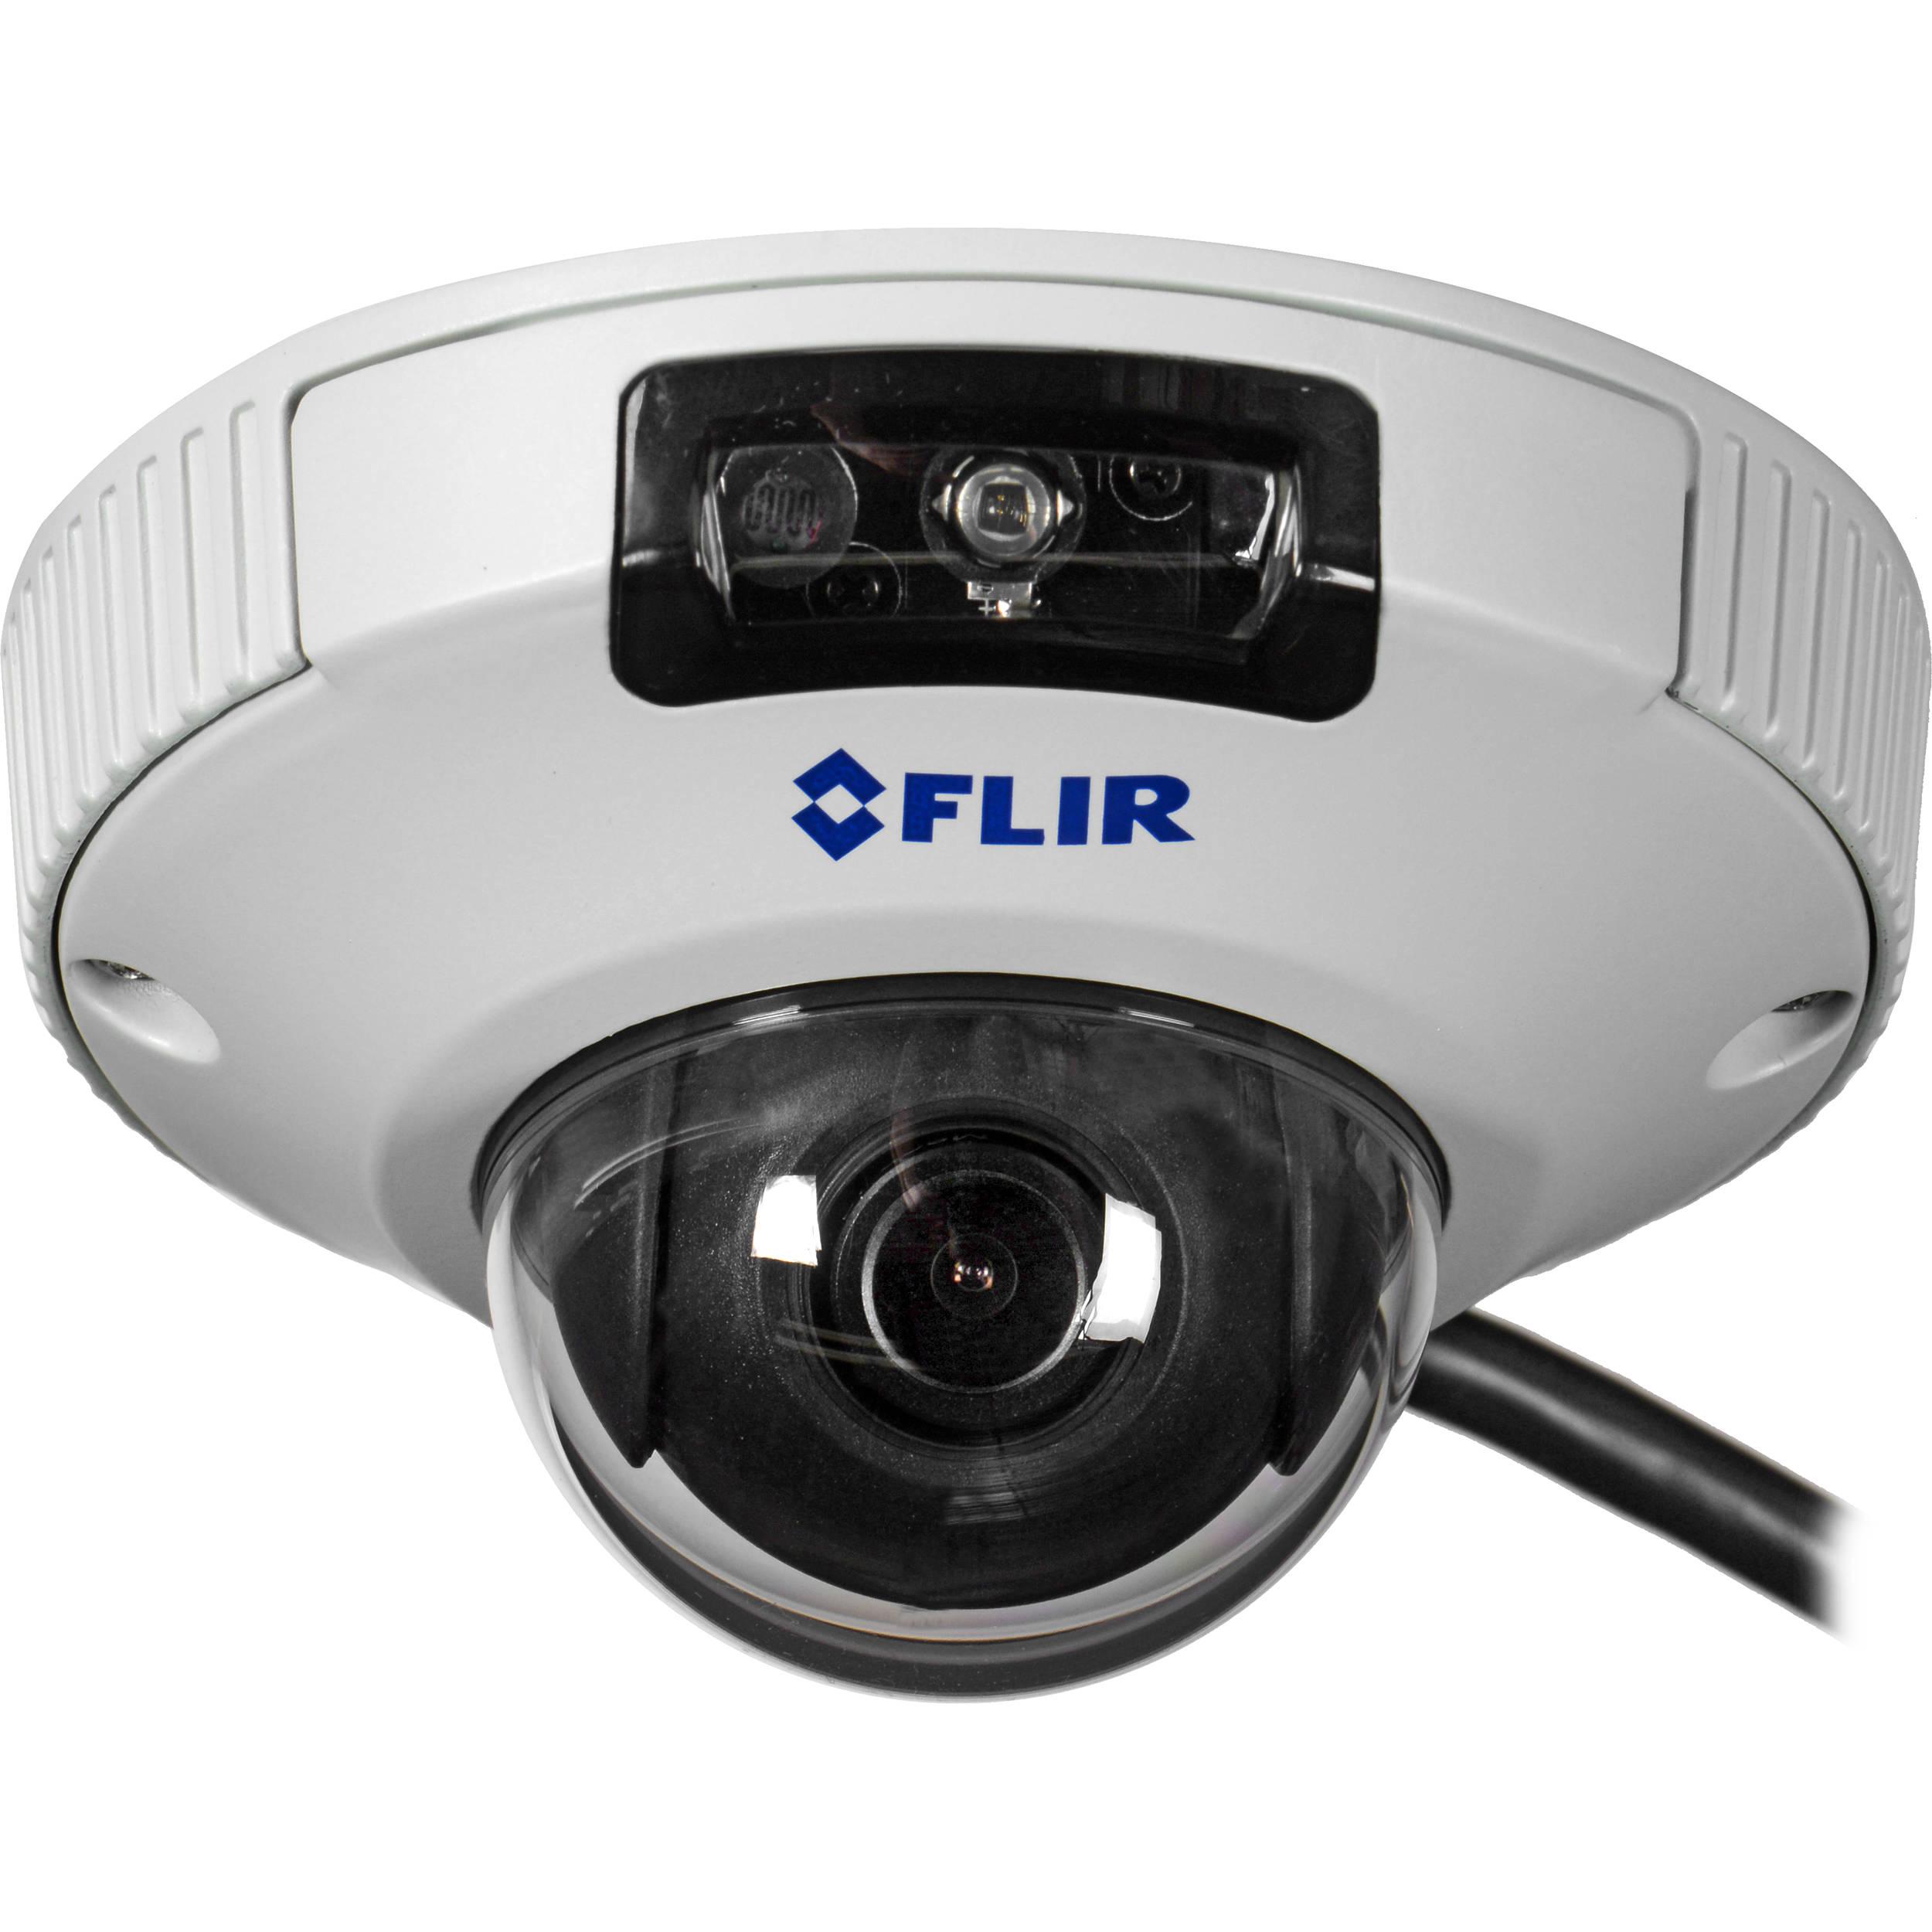 flir 2 1mp fixed lens mini dome ip camera with ir. Black Bedroom Furniture Sets. Home Design Ideas